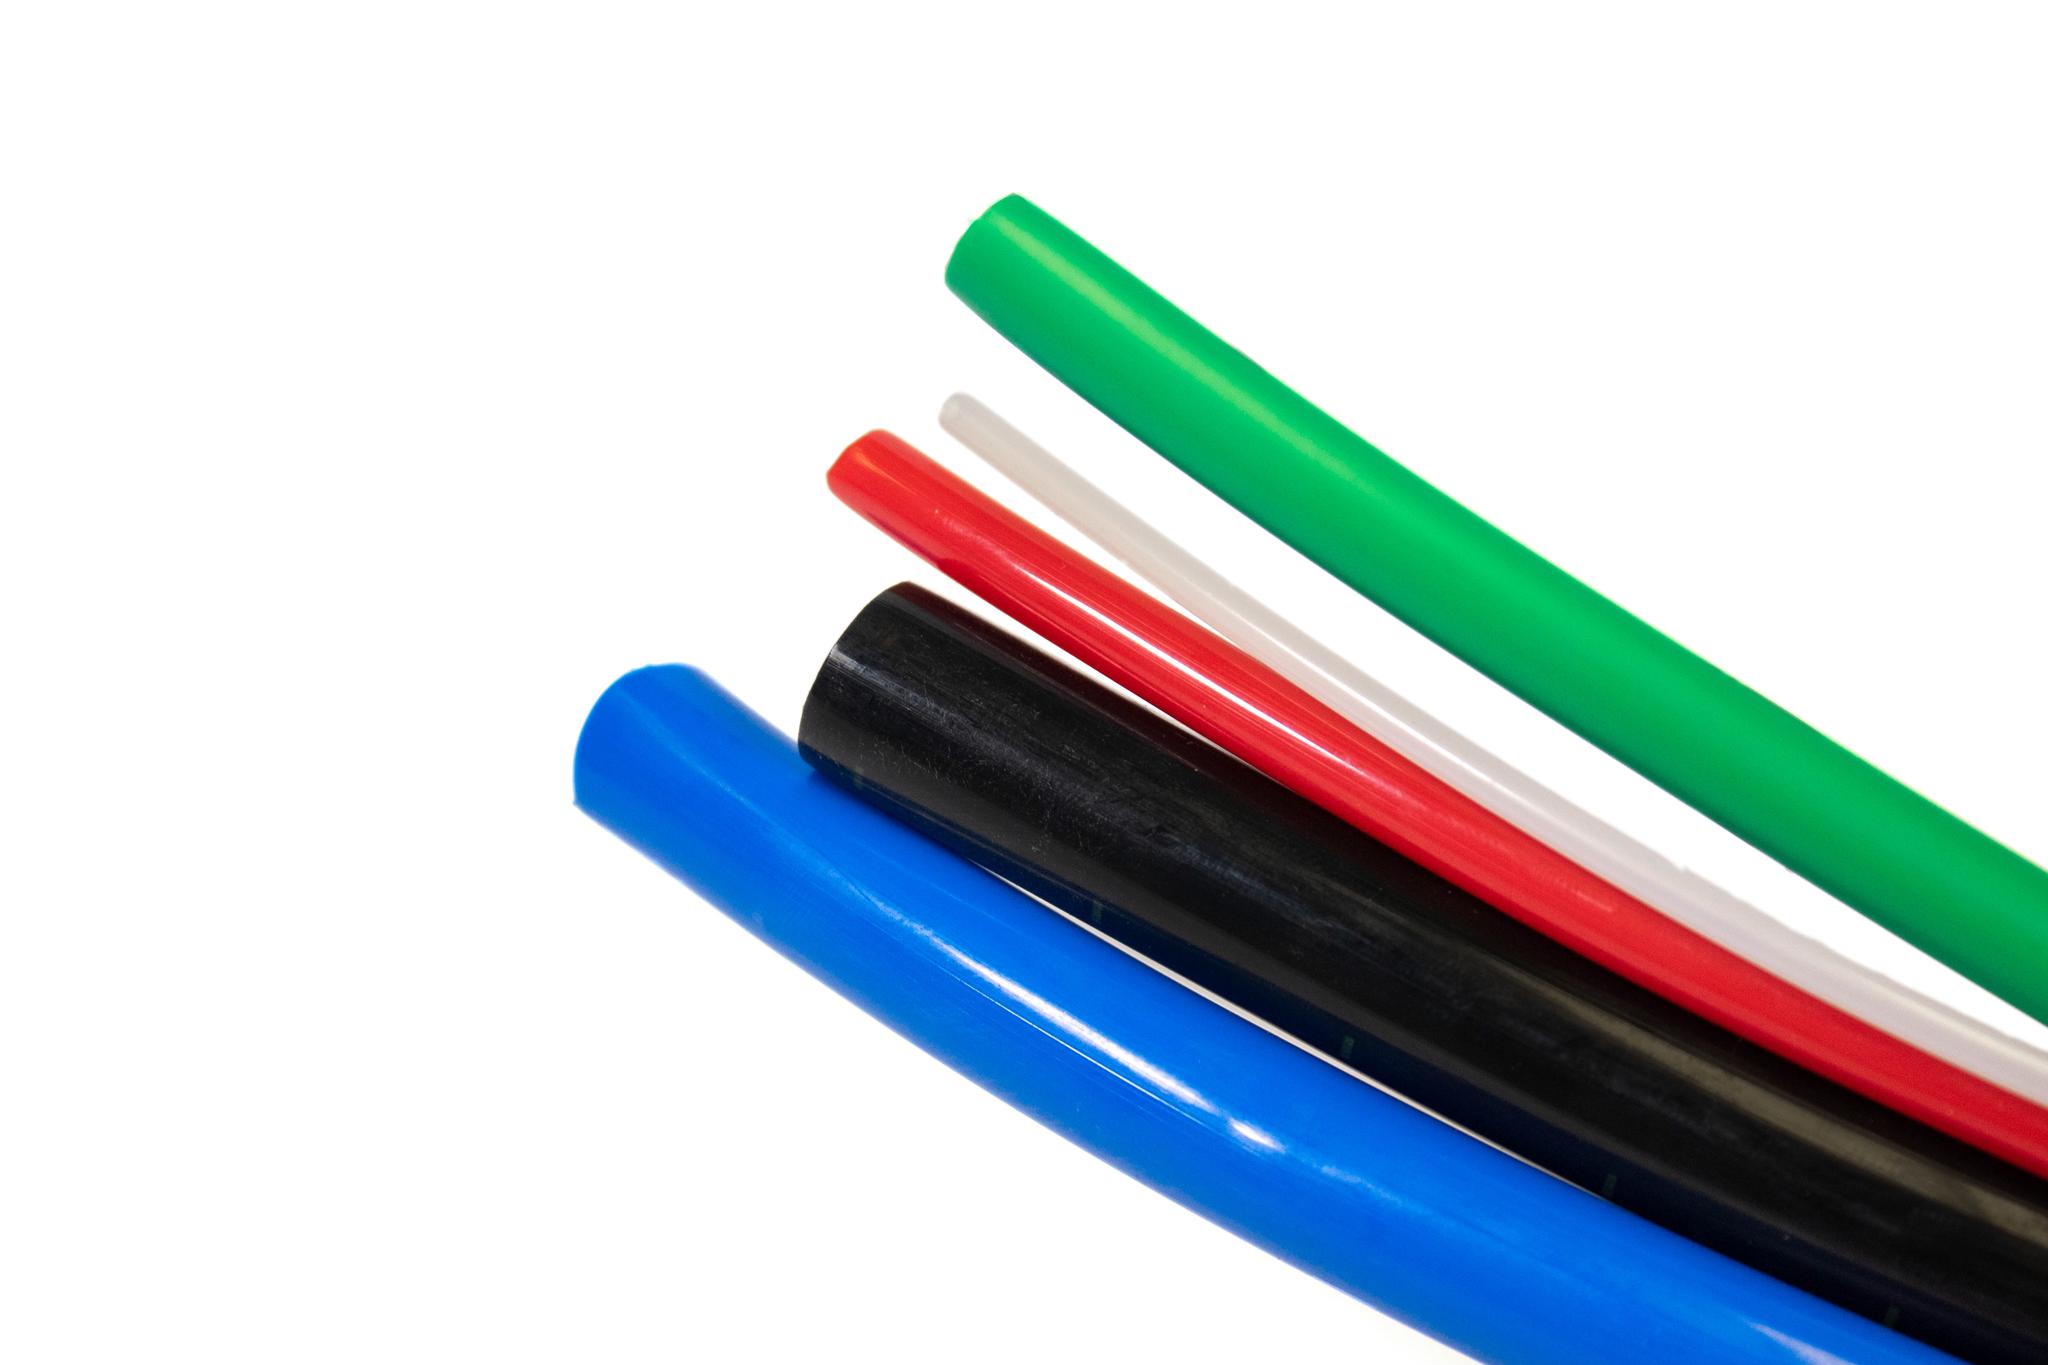 Flexible Nylon Hose Tubing Thick Wall 28.0mm O/D x 22.0mm I/D x 3.0mm Wall Natural